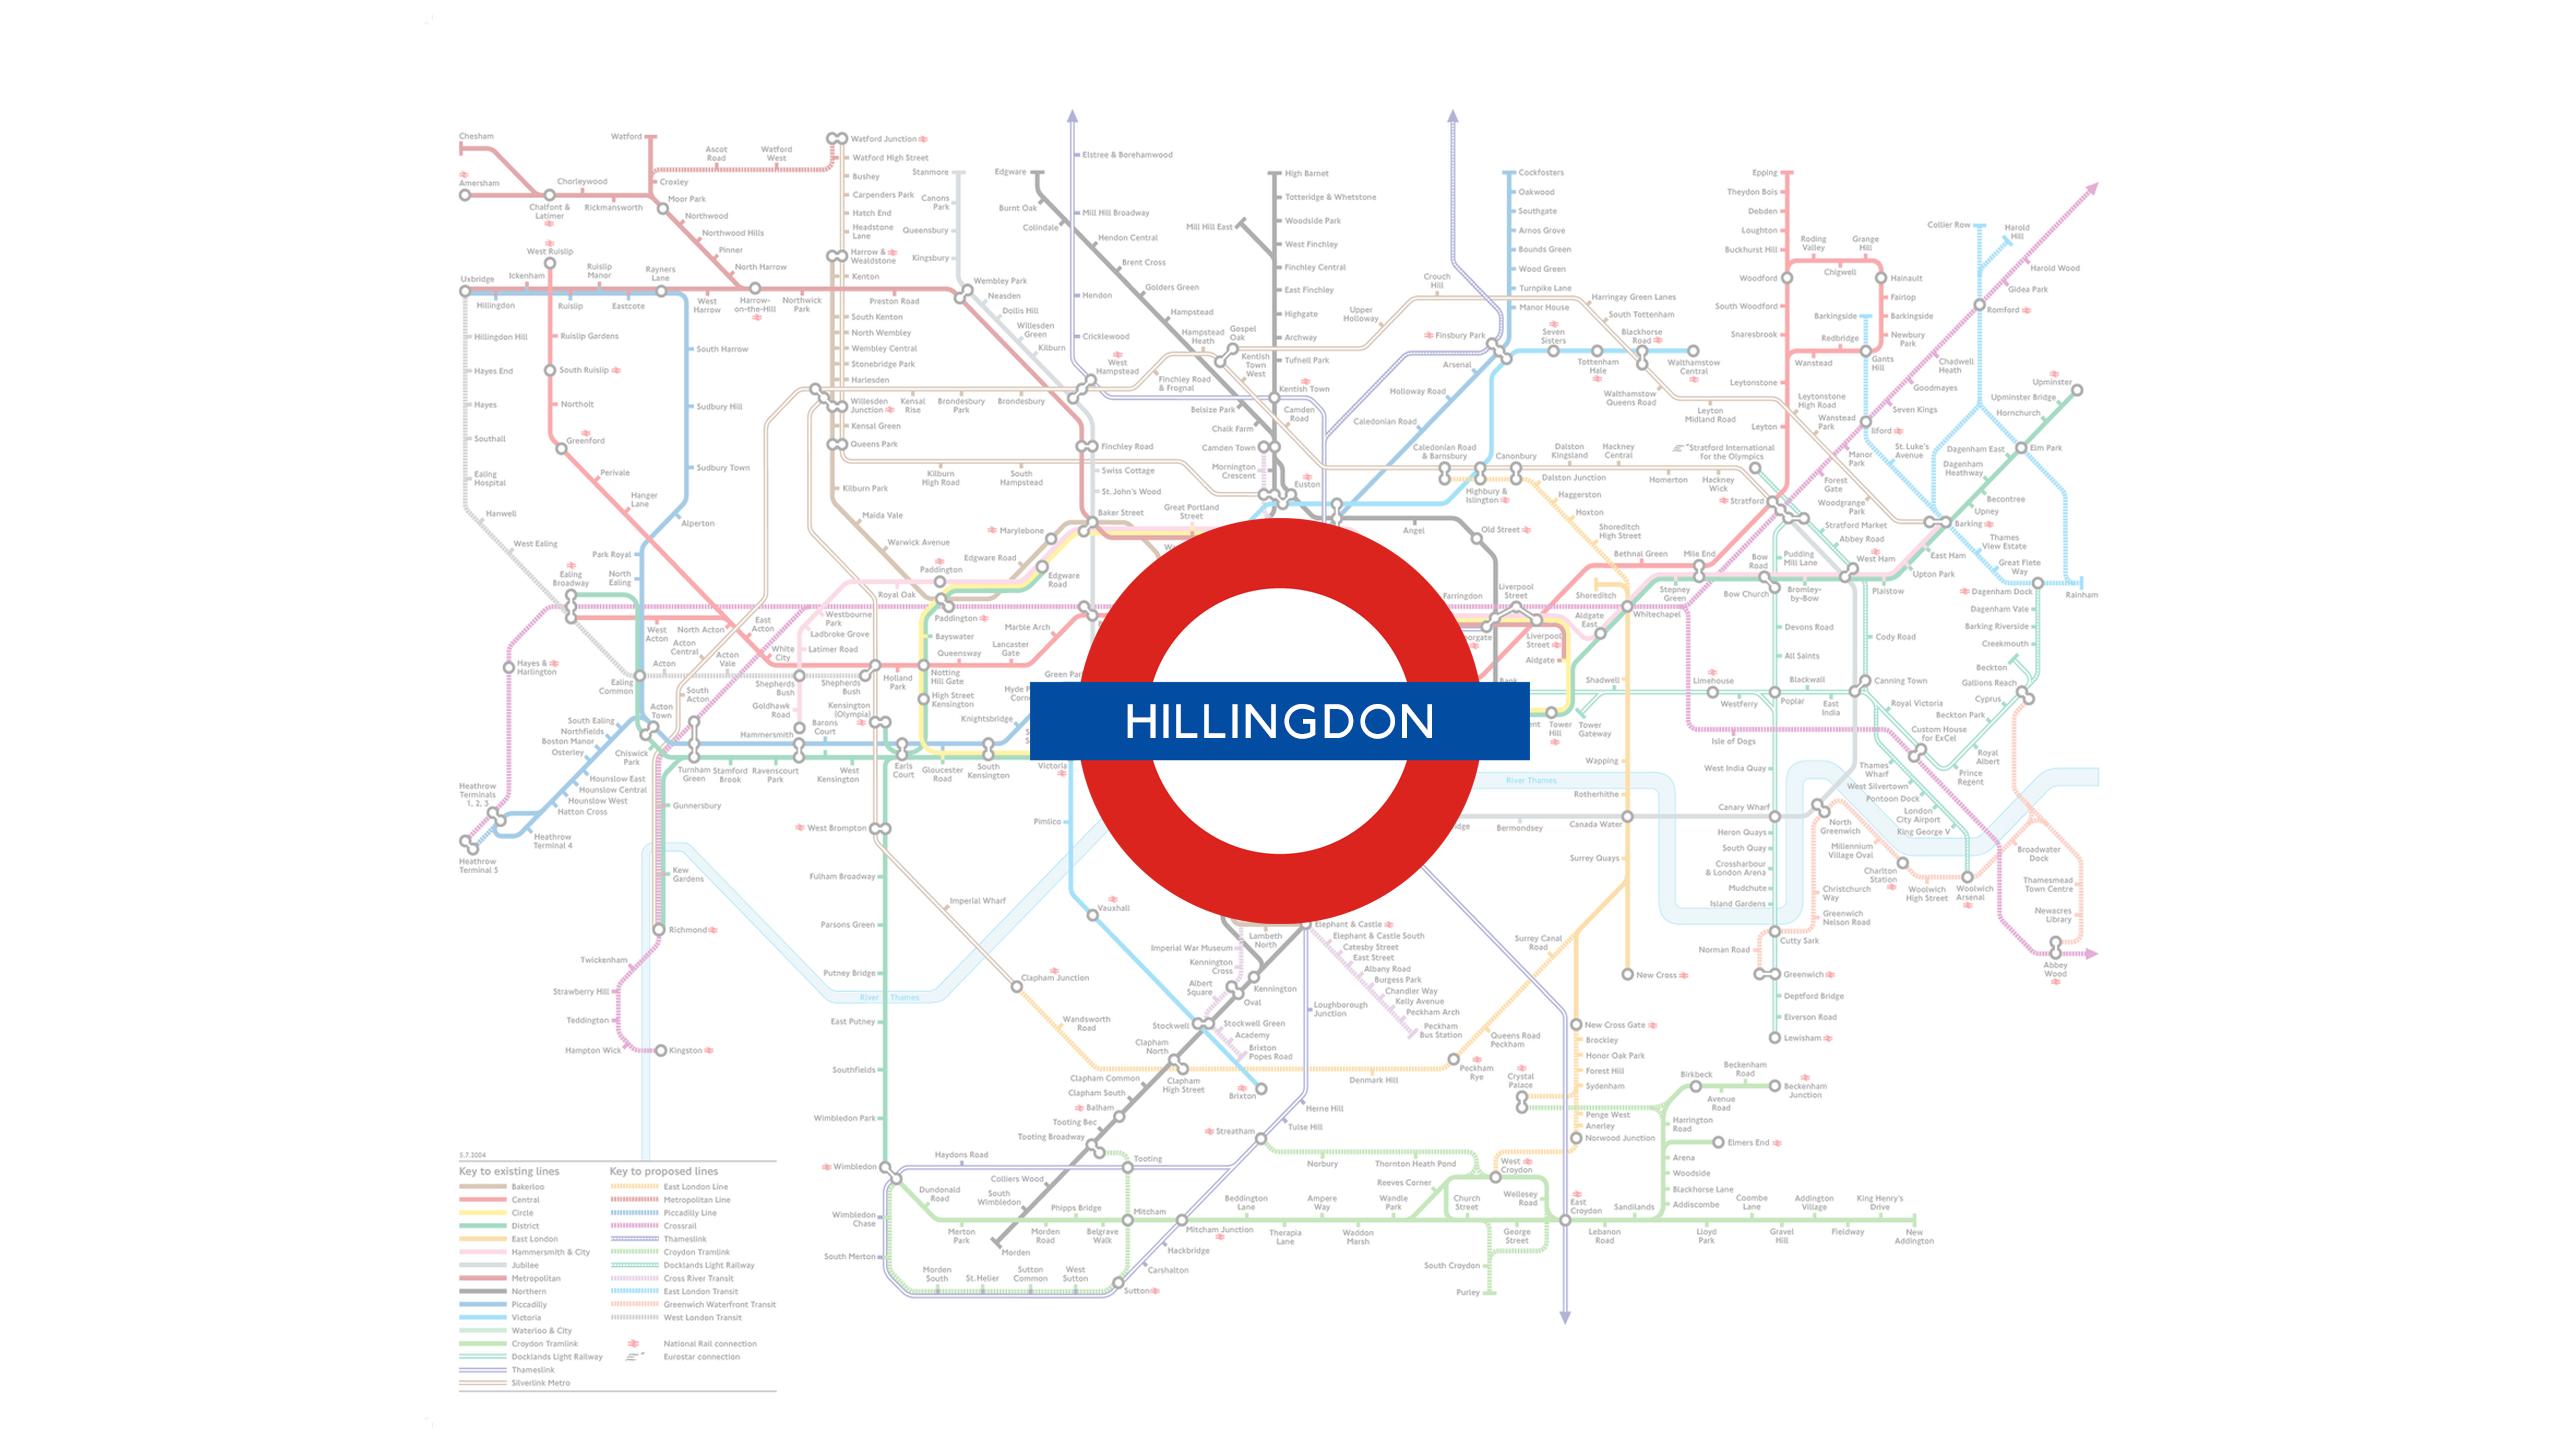 Hillingdon (Map)